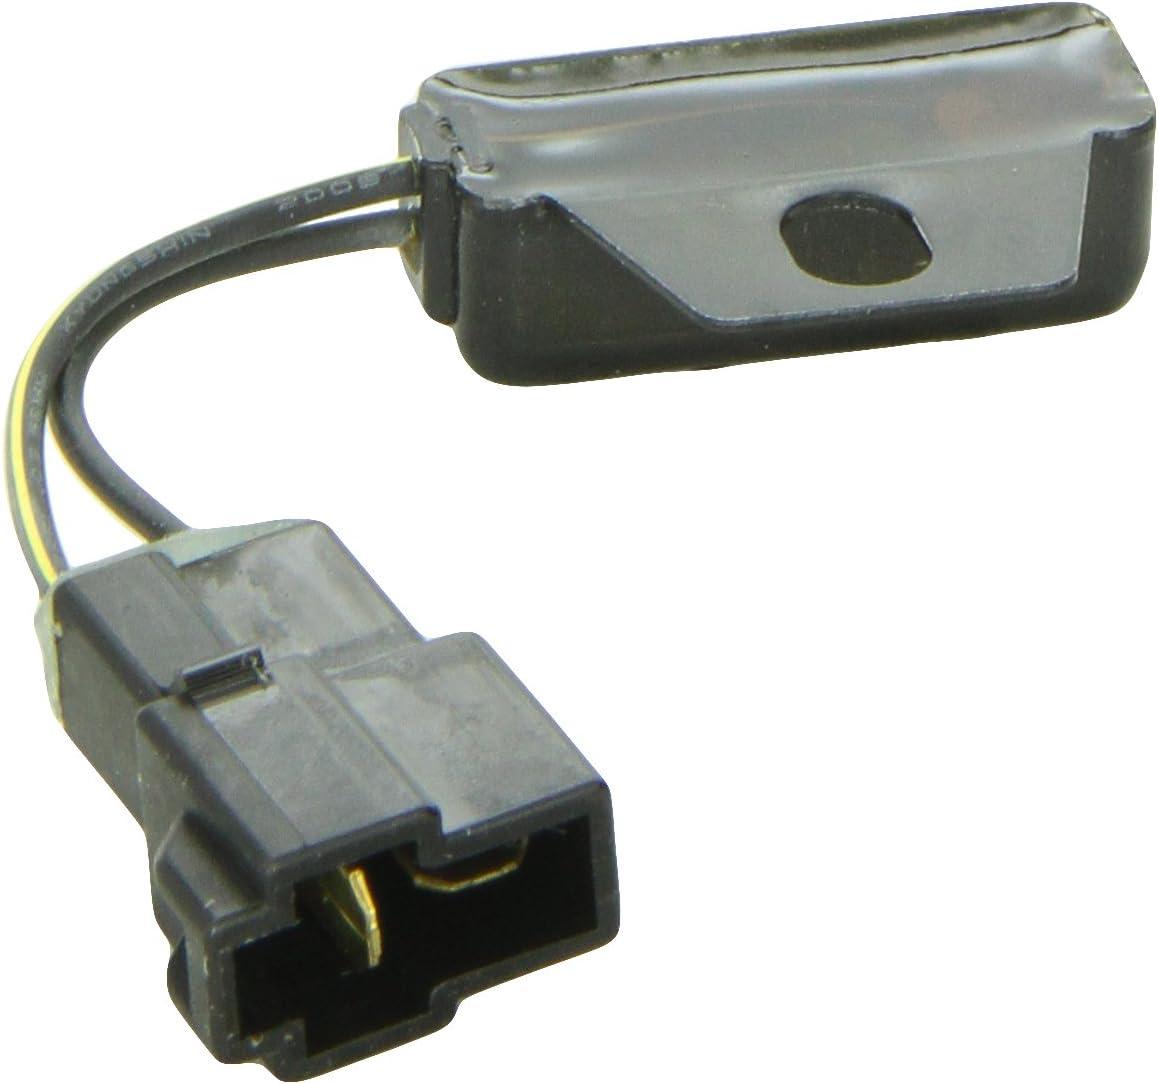 HYUNDAI Genuine 28177-32510 Noise Filter